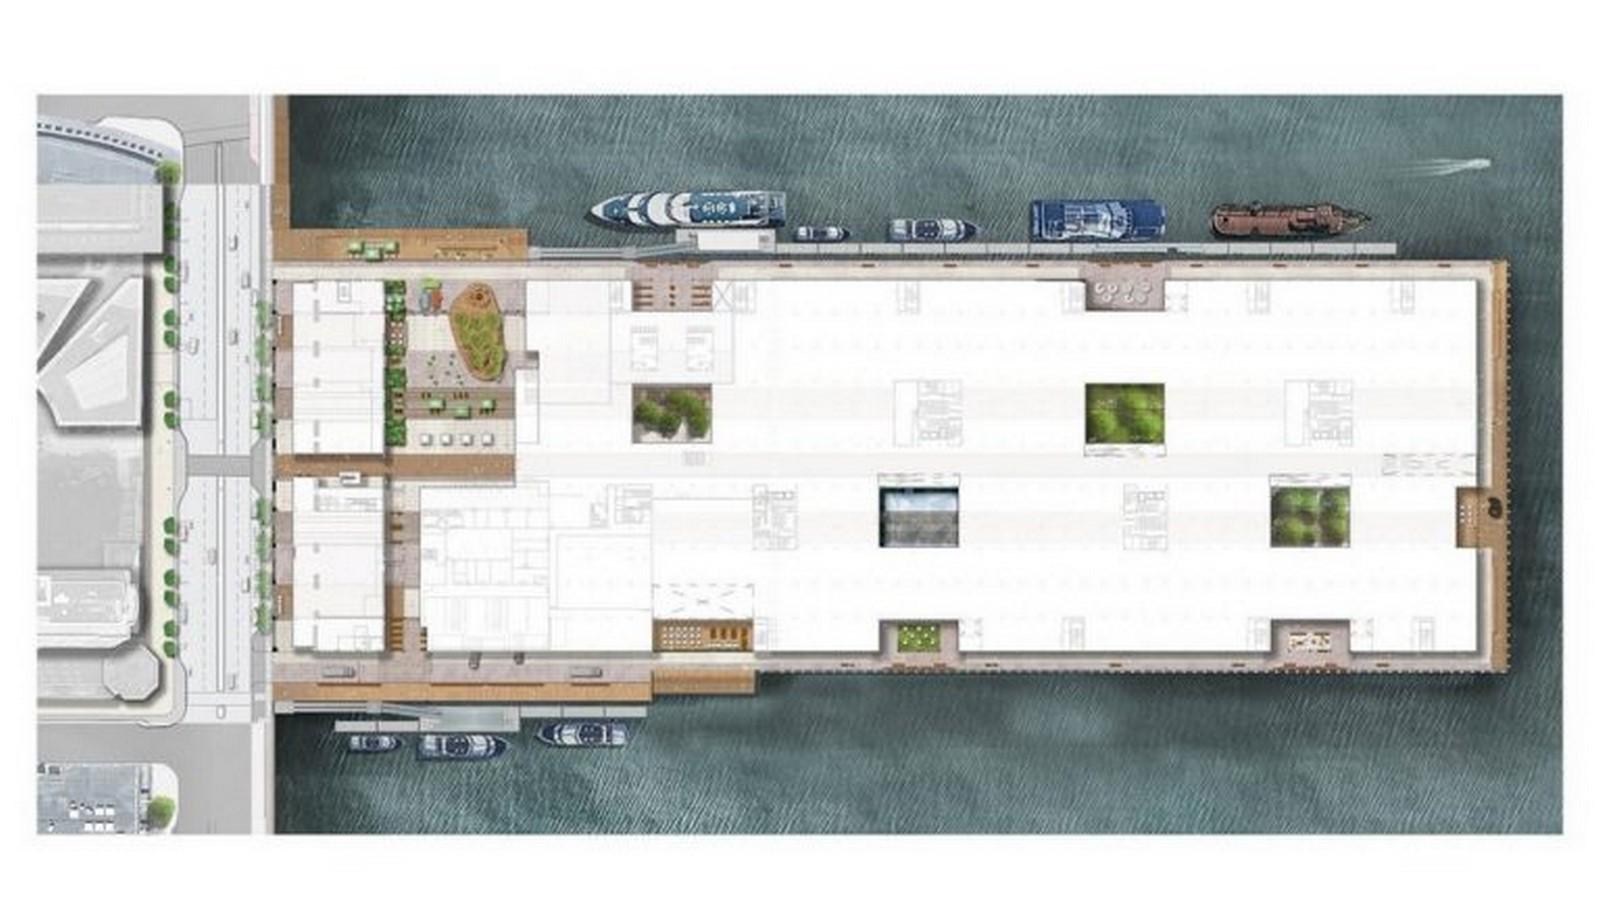 Construction begins at Boston's Commonwealth Pier designed by Schmidt Hammer Lassen Architects - Sheet6